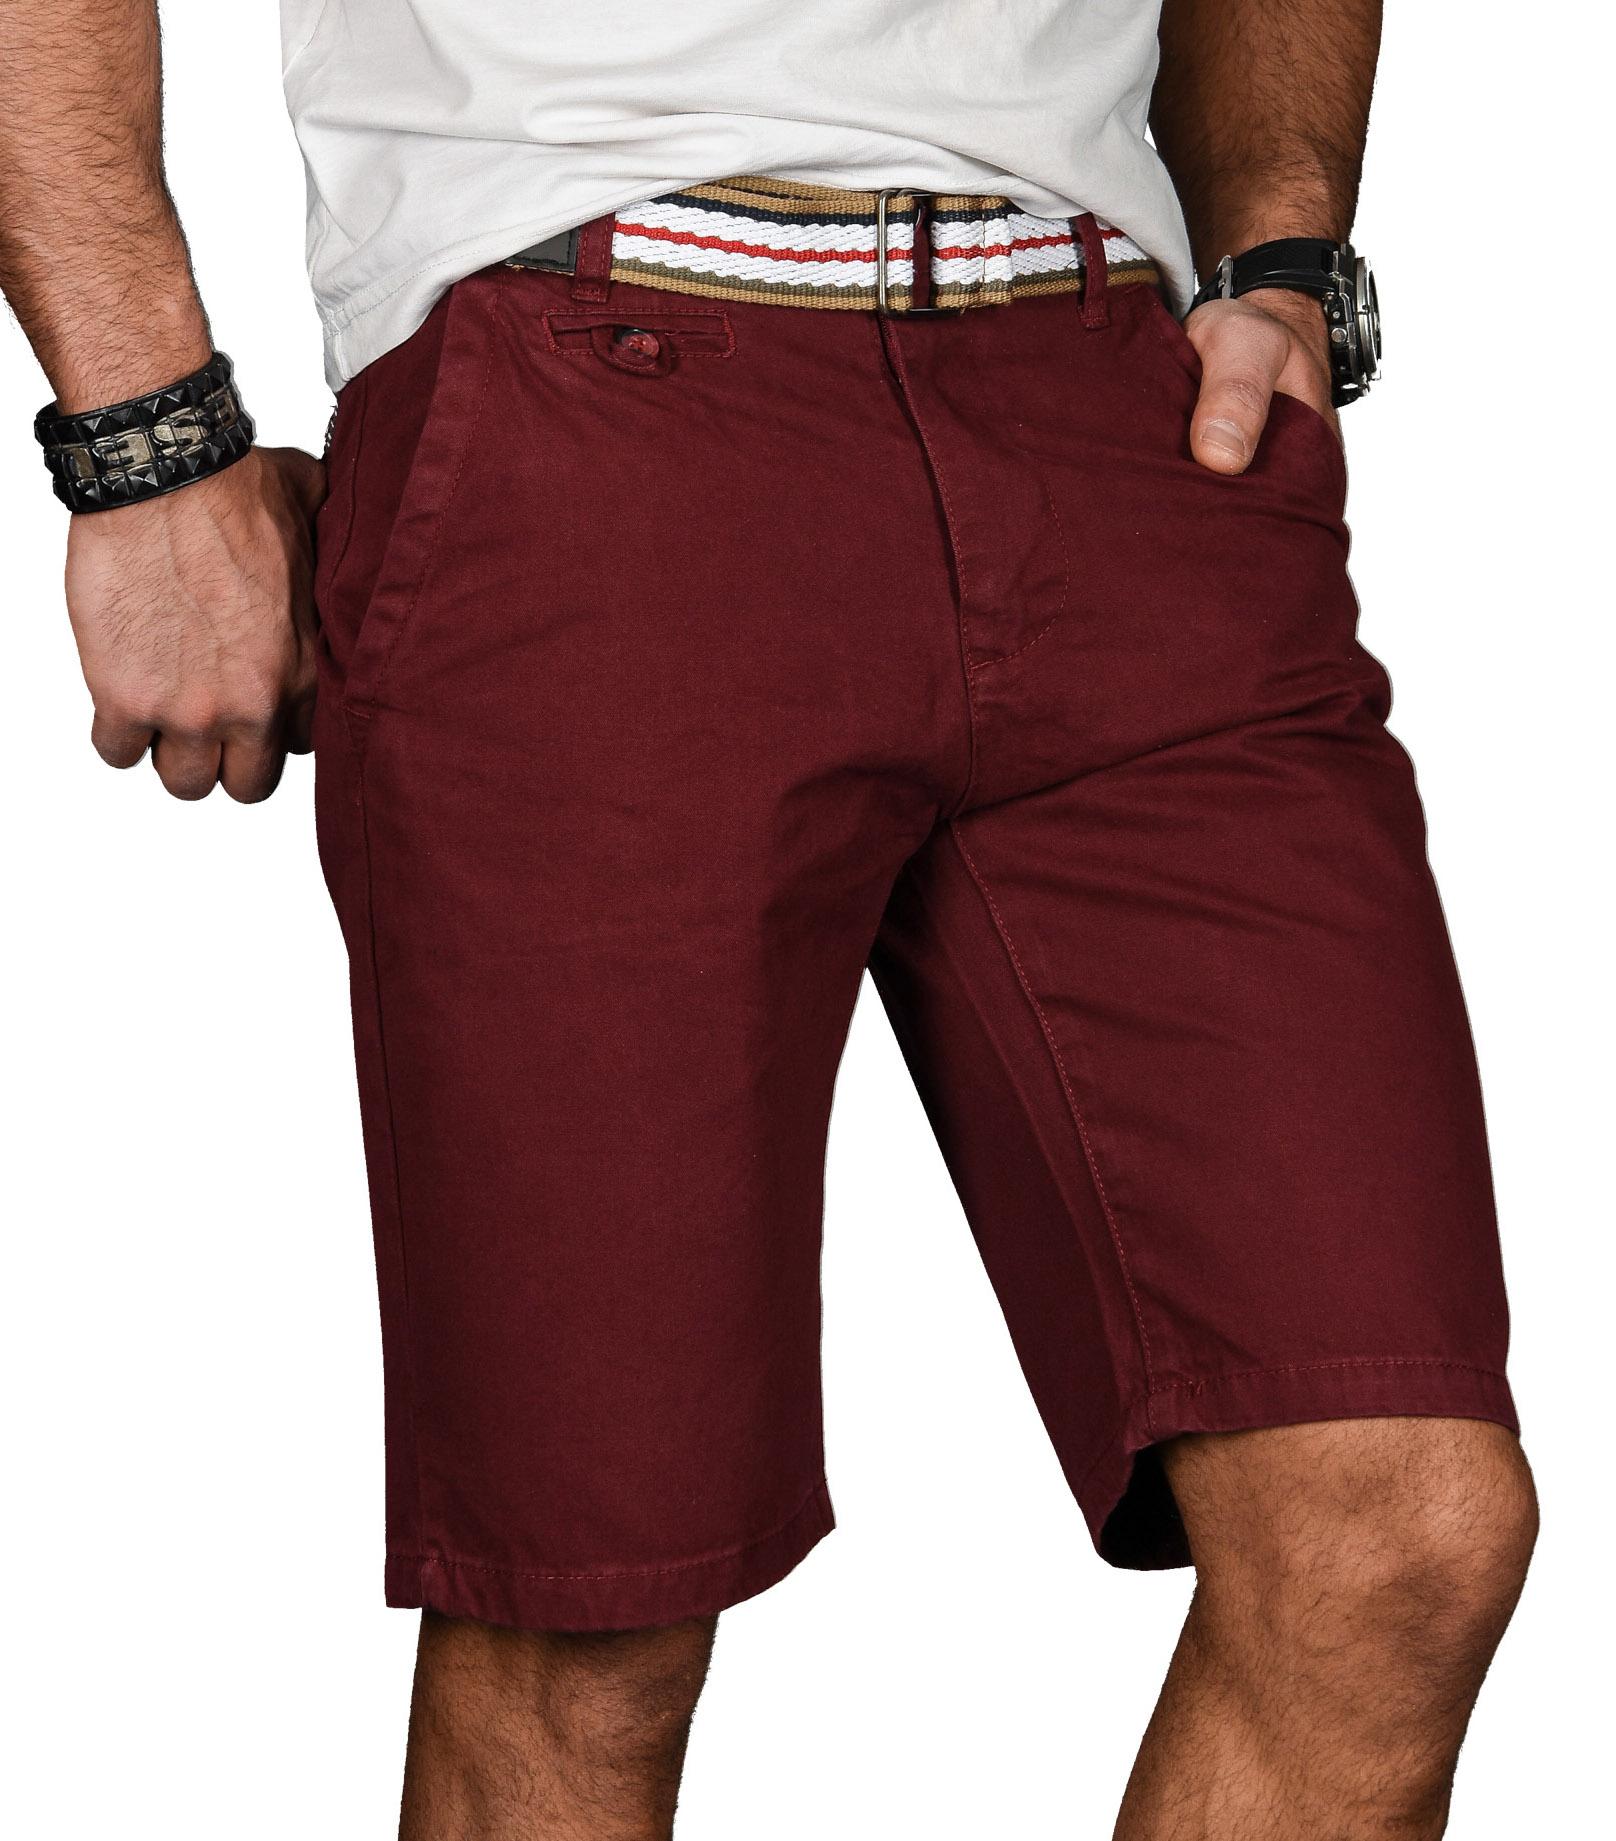 A-Salvarini-Herren-Shorts-kurze-Sommer-Hose-mit-Guertel-Short-Bermuda-NEU-AS096 Indexbild 33